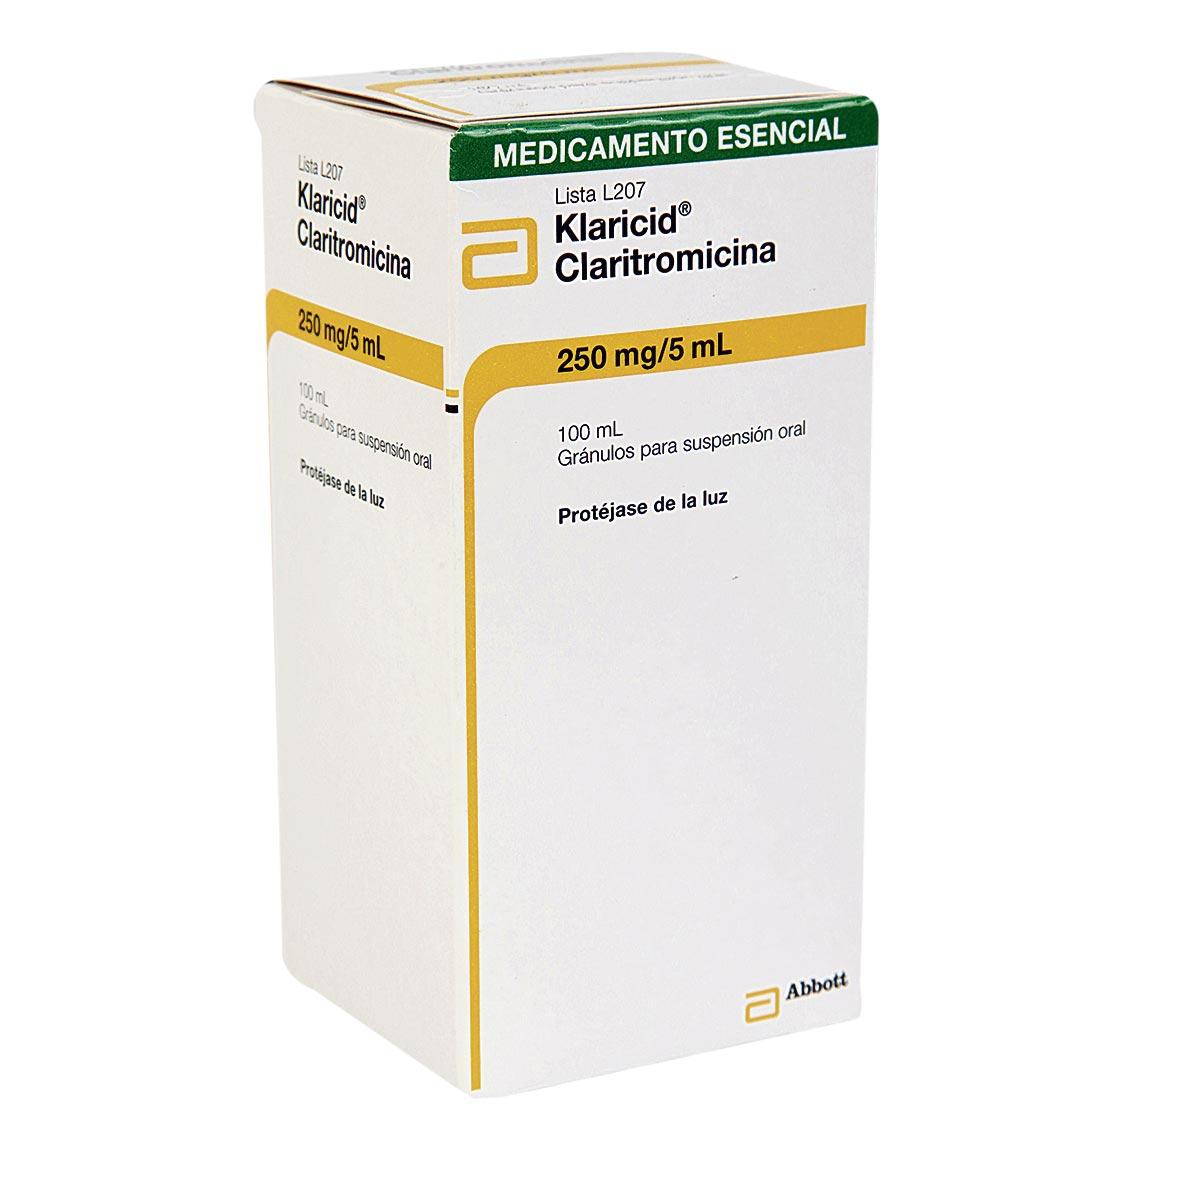 Klaricid 250 Mg 5 Ml Suspension Oral Colsubsidio